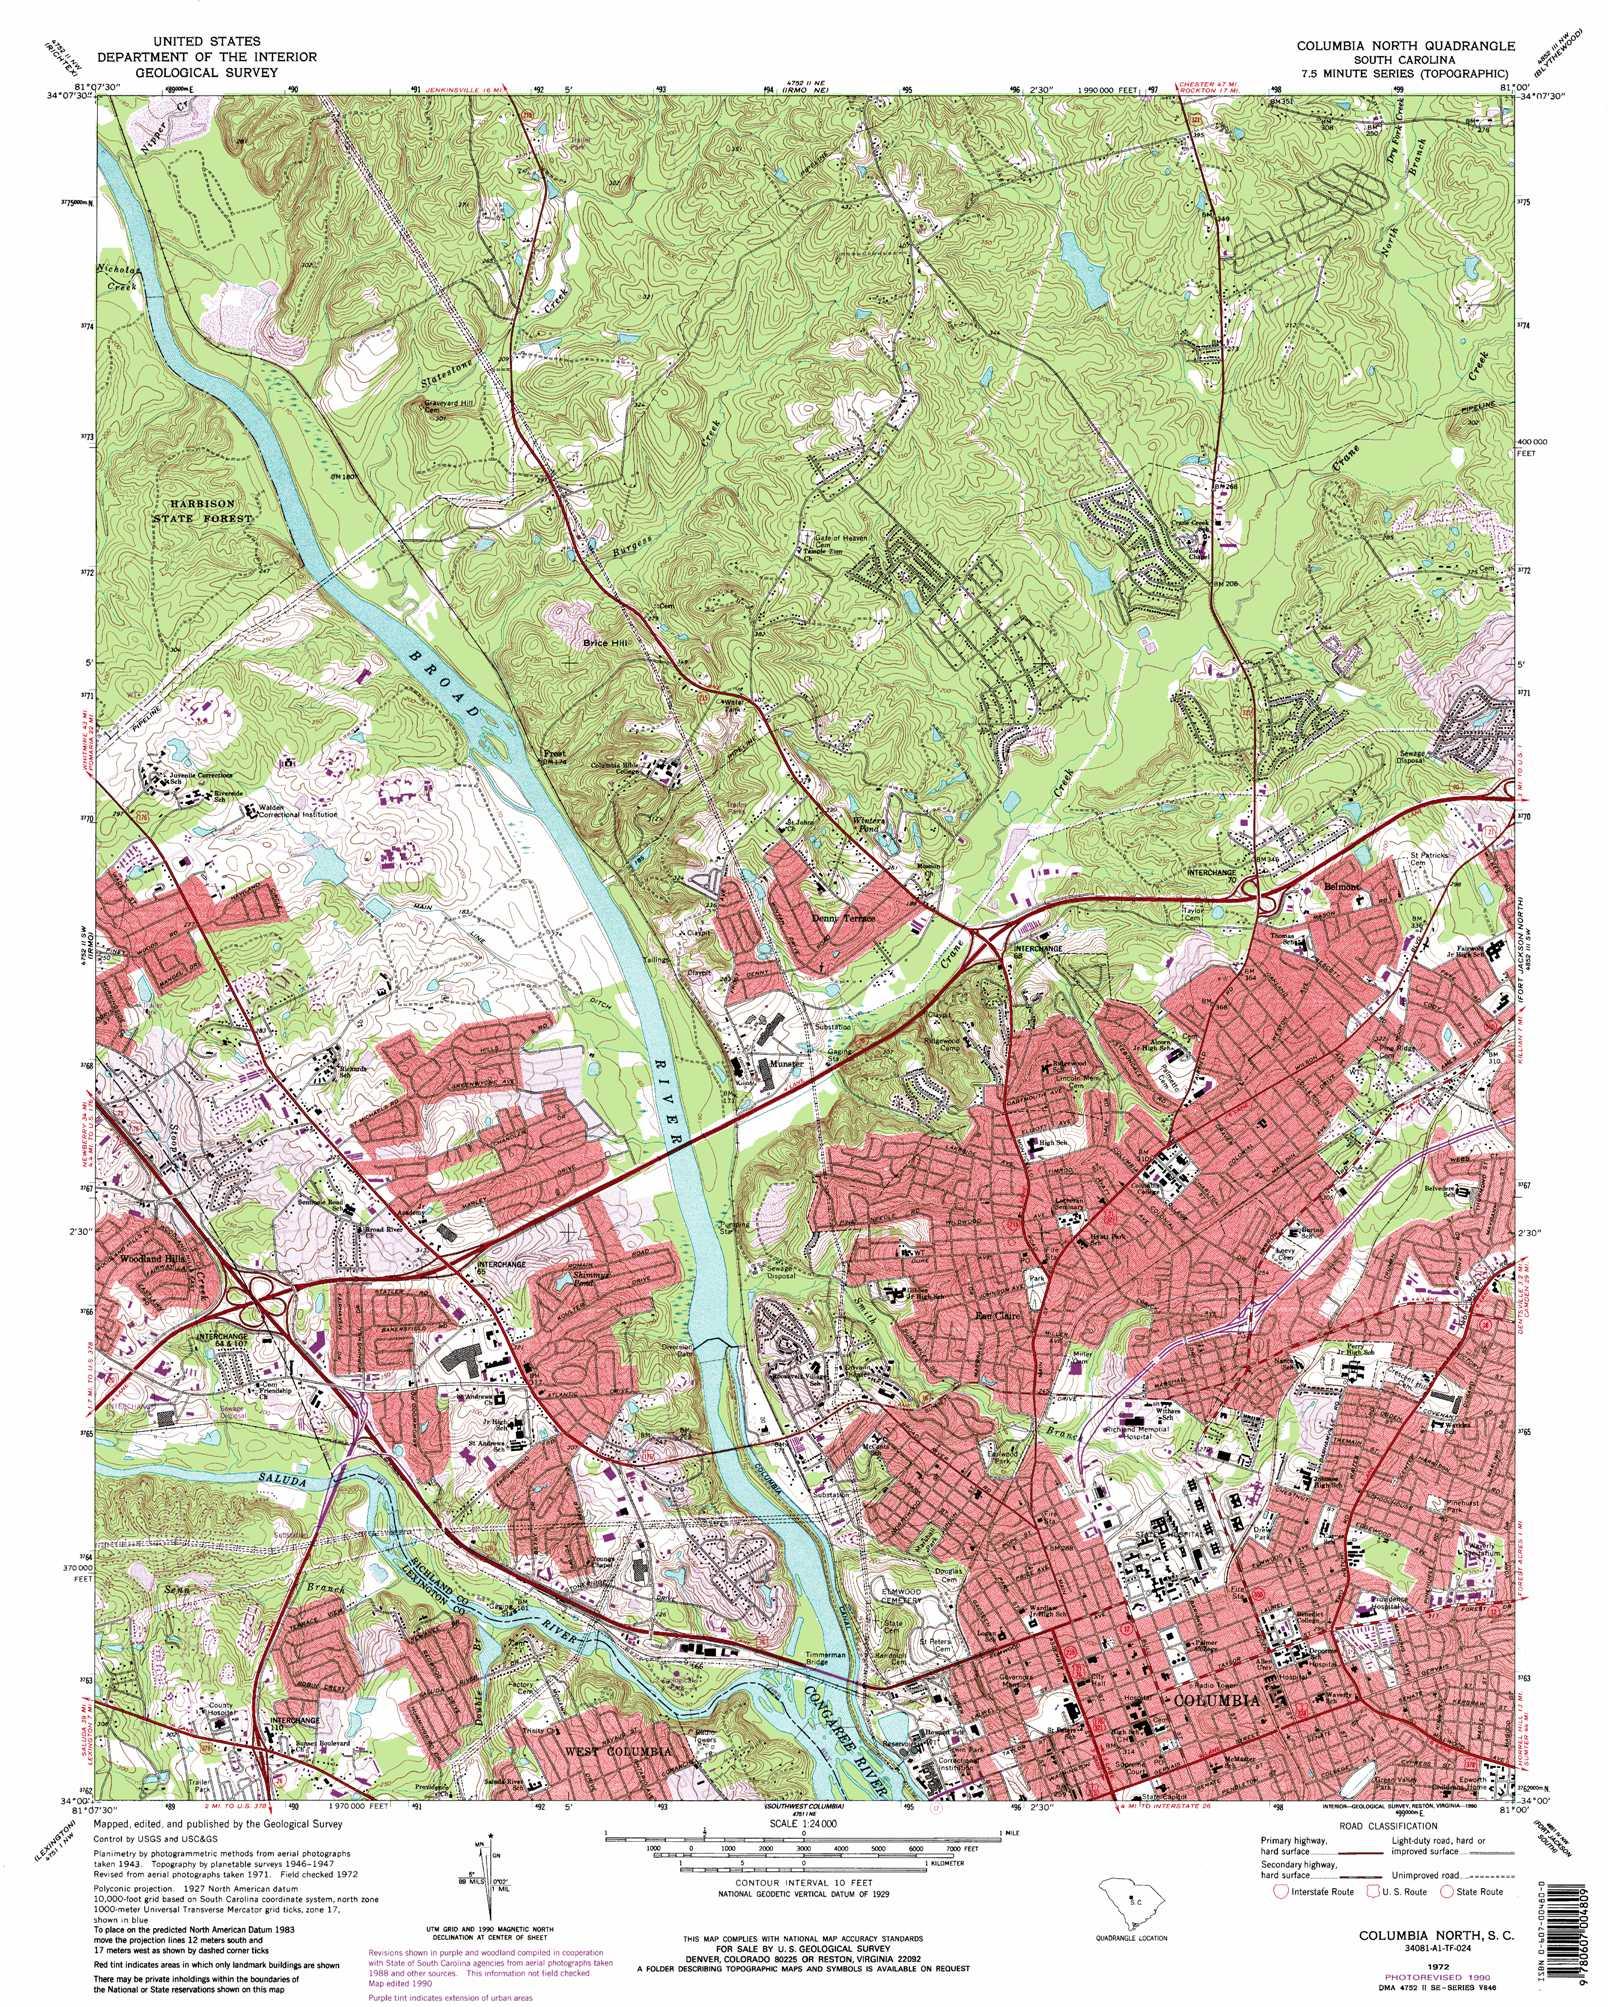 Columbia North topographic map, SC - USGS Topo Quad 34081a1